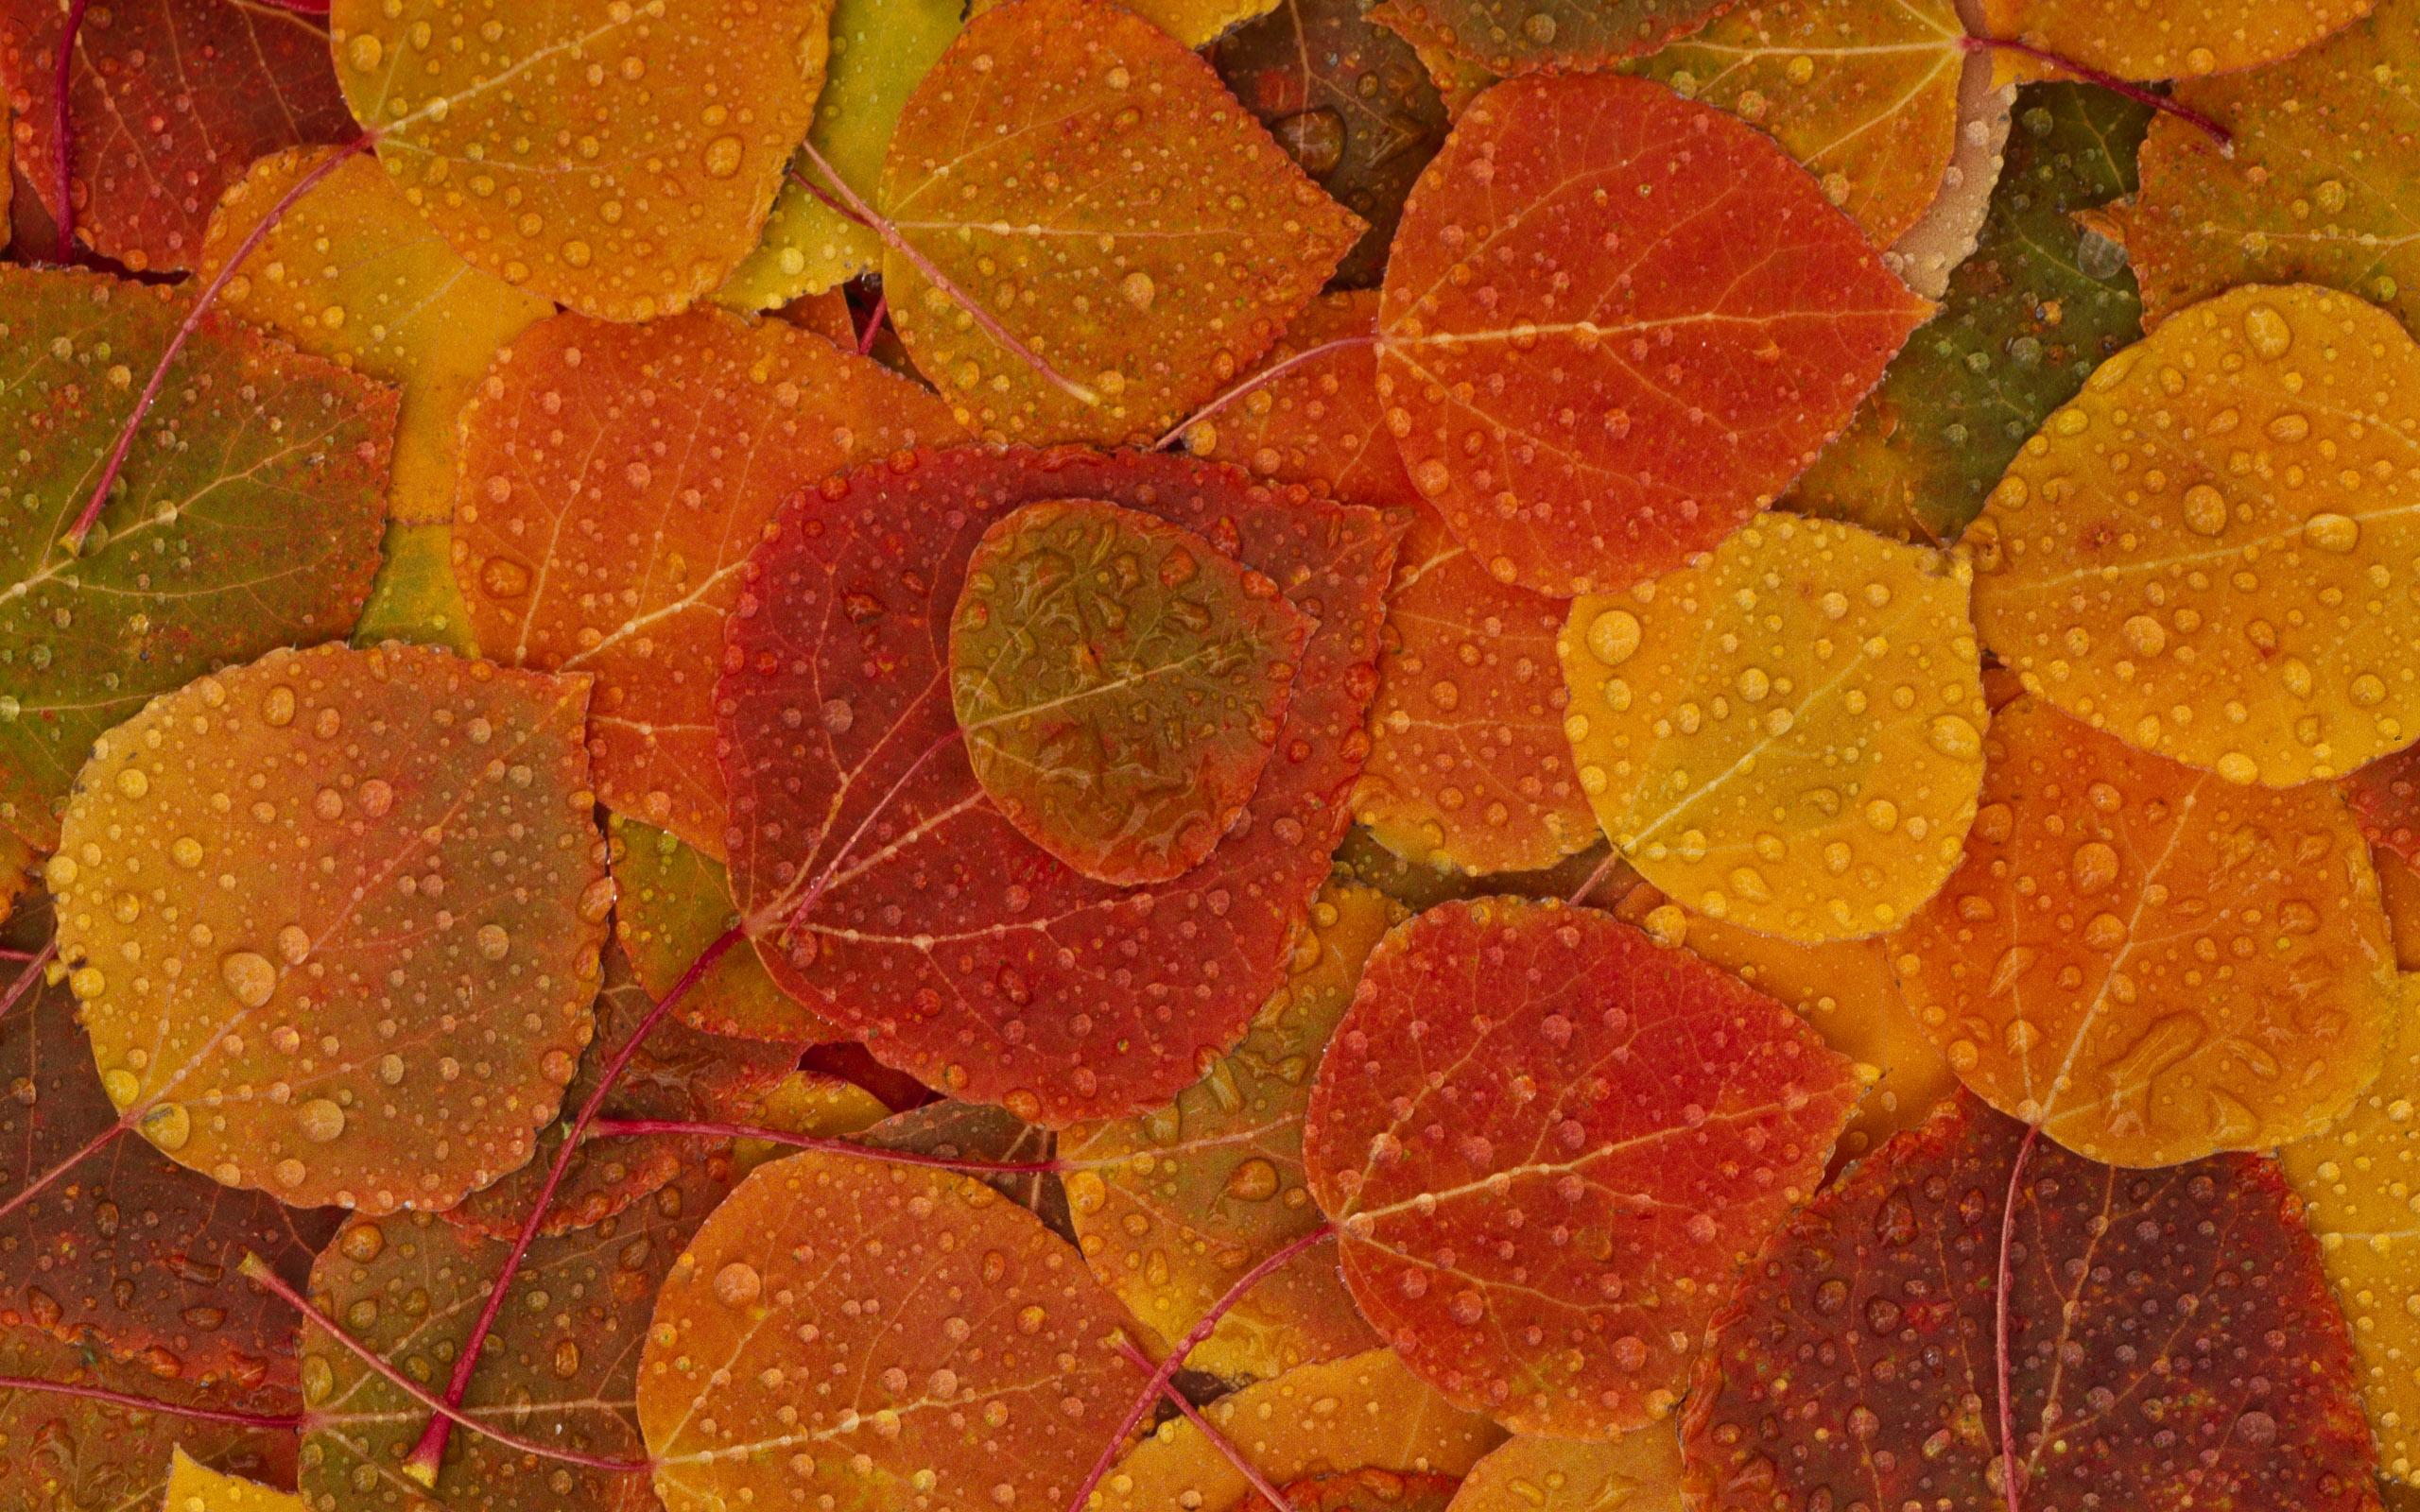 ws_fall_leaves_2560x1600.jpg